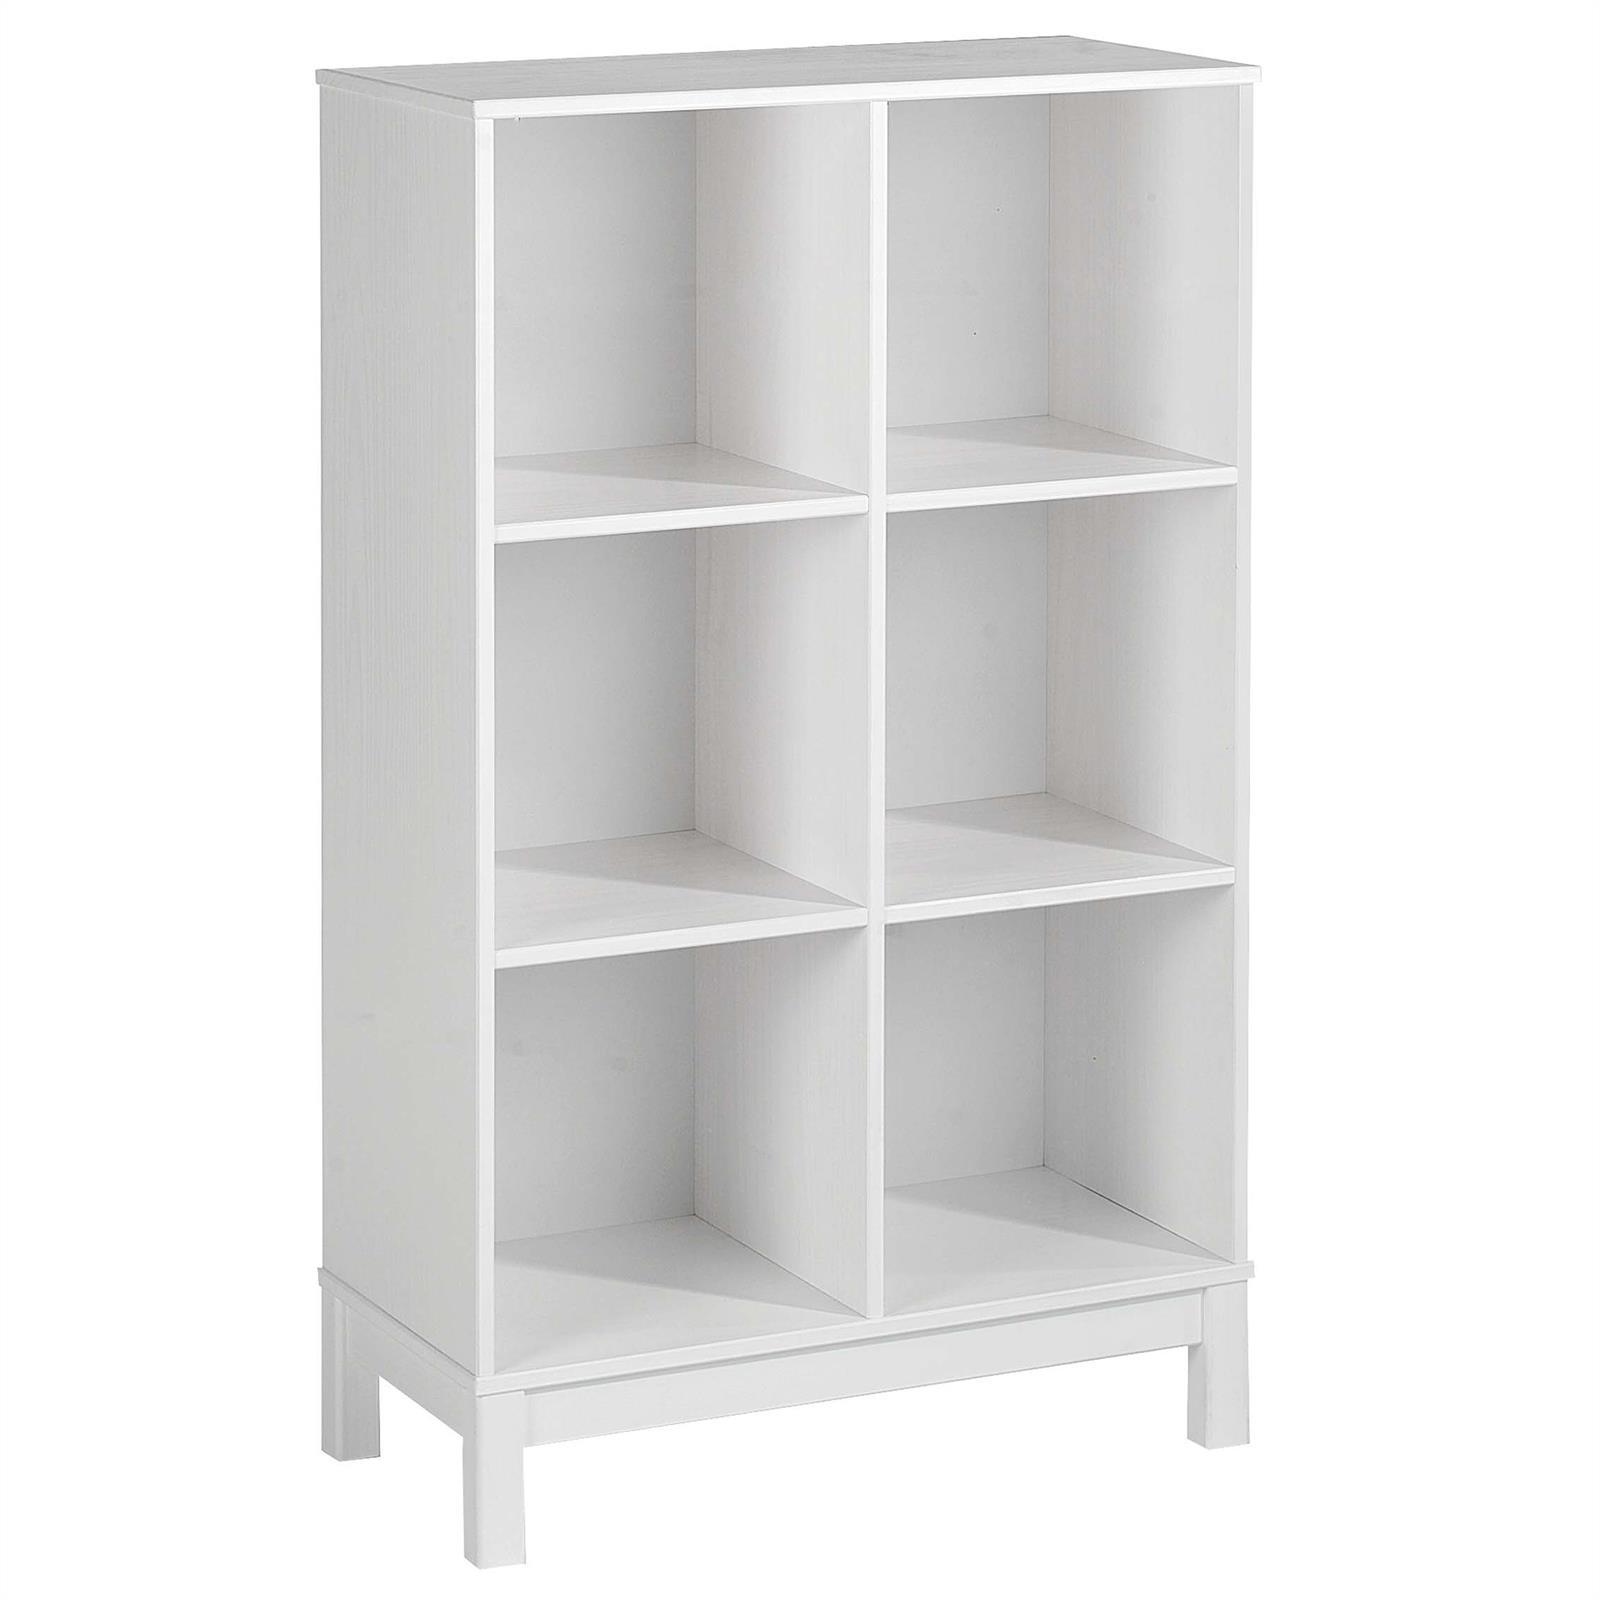 regal standregal b cherregal b roregal kiefer massiv farbauswahl ebay. Black Bedroom Furniture Sets. Home Design Ideas